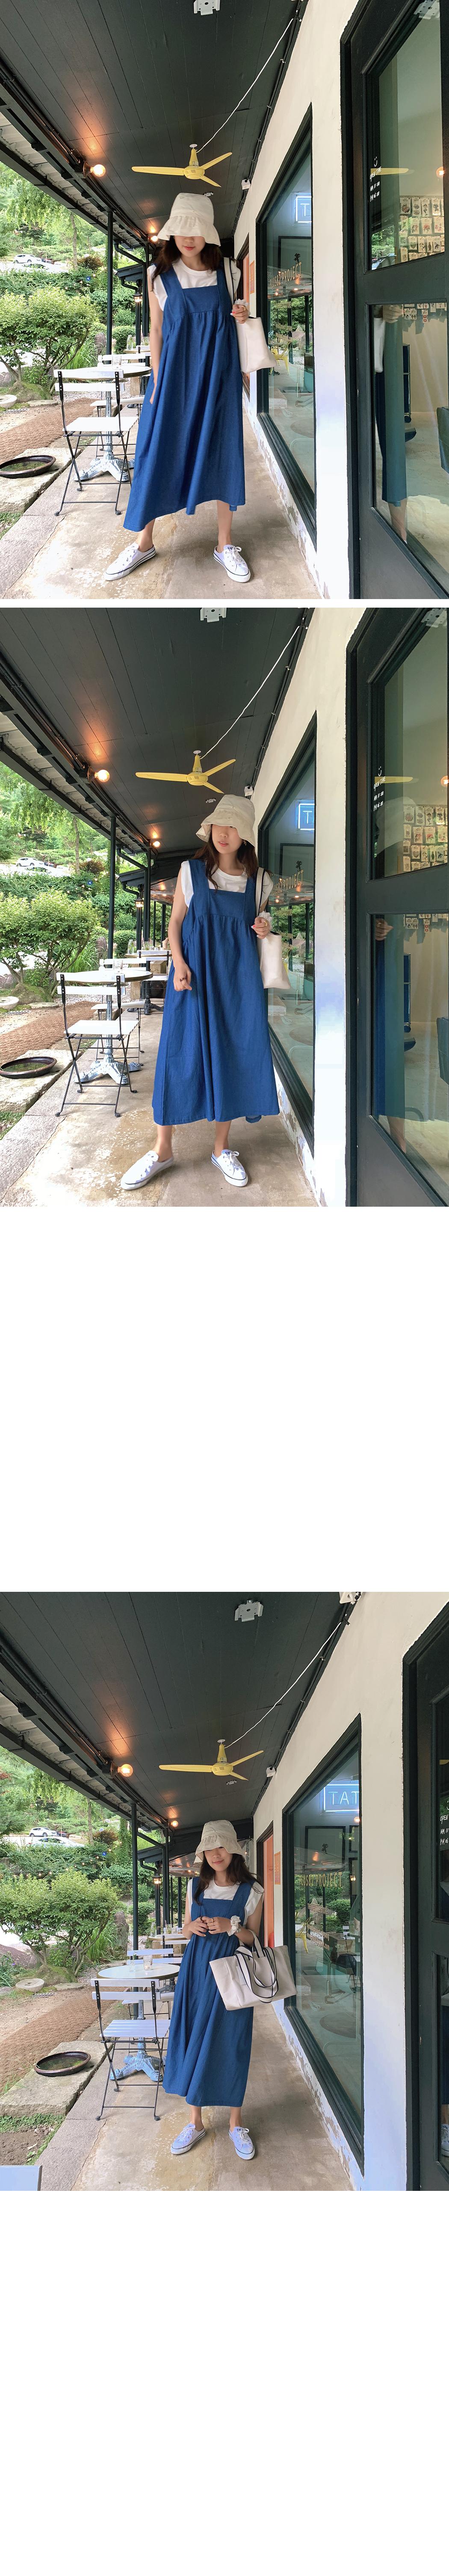 Heidi Square Denim Dress